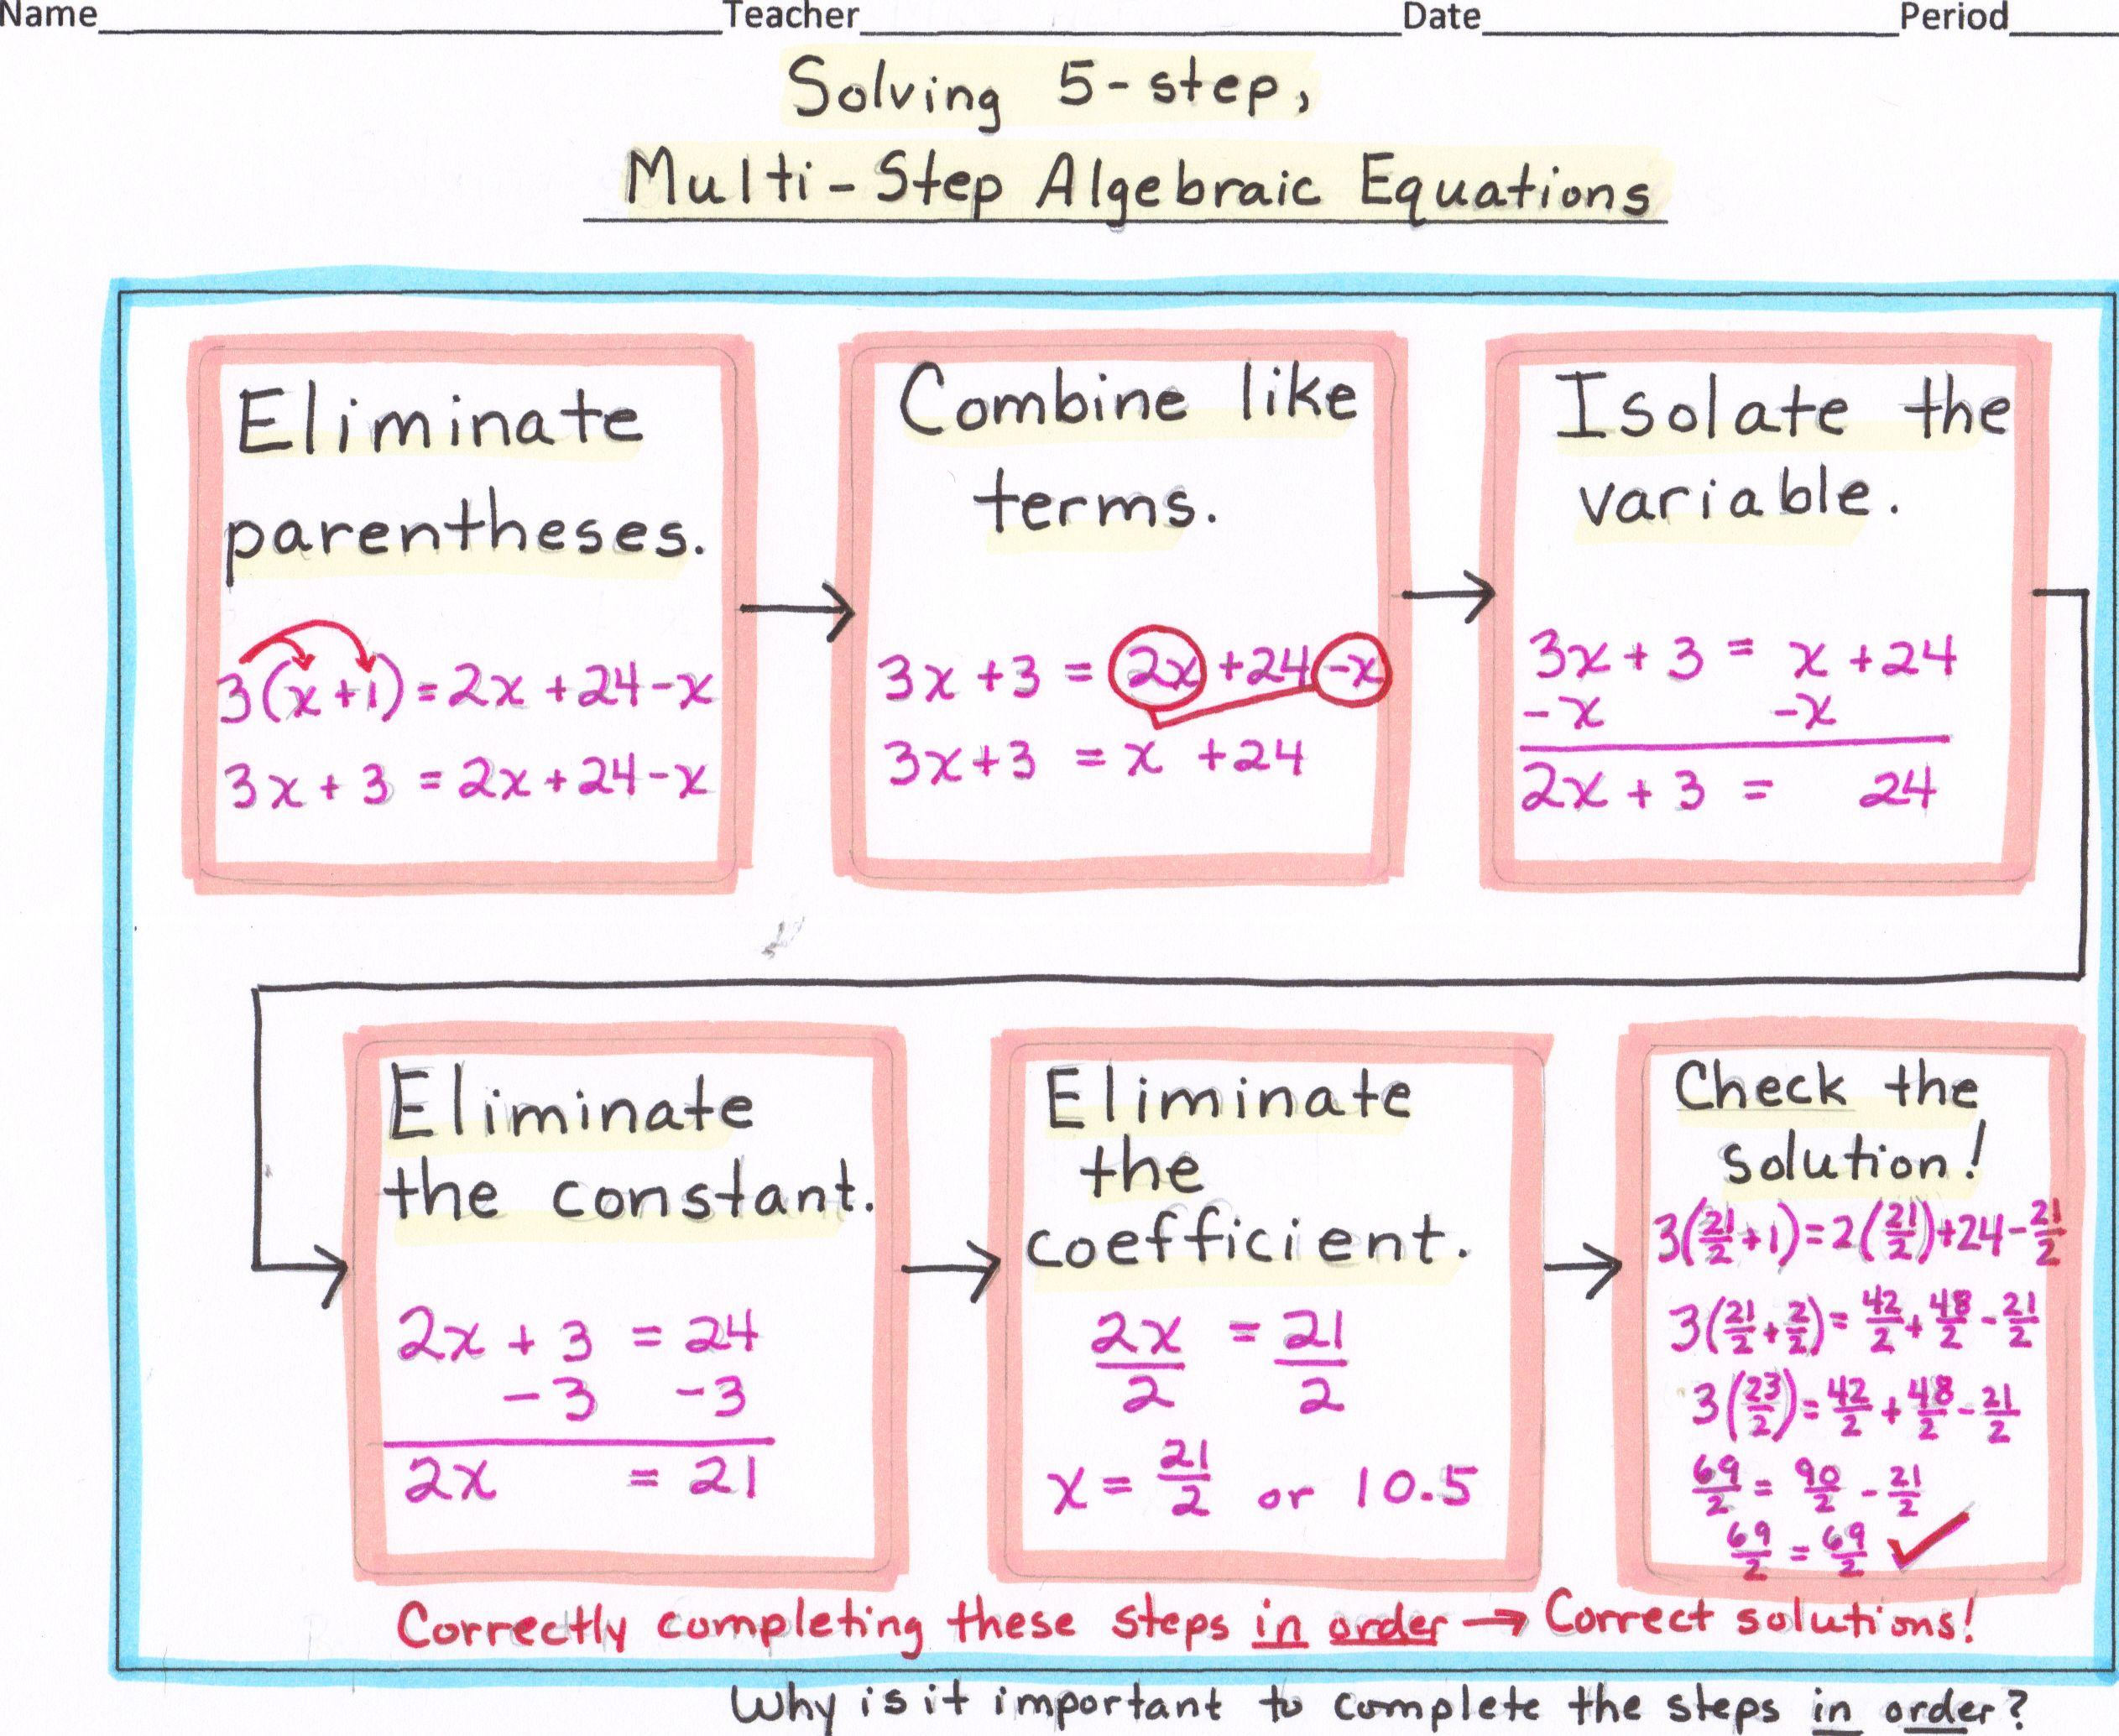 Math Algebra Flow Map Solving Multi Step Algebraic